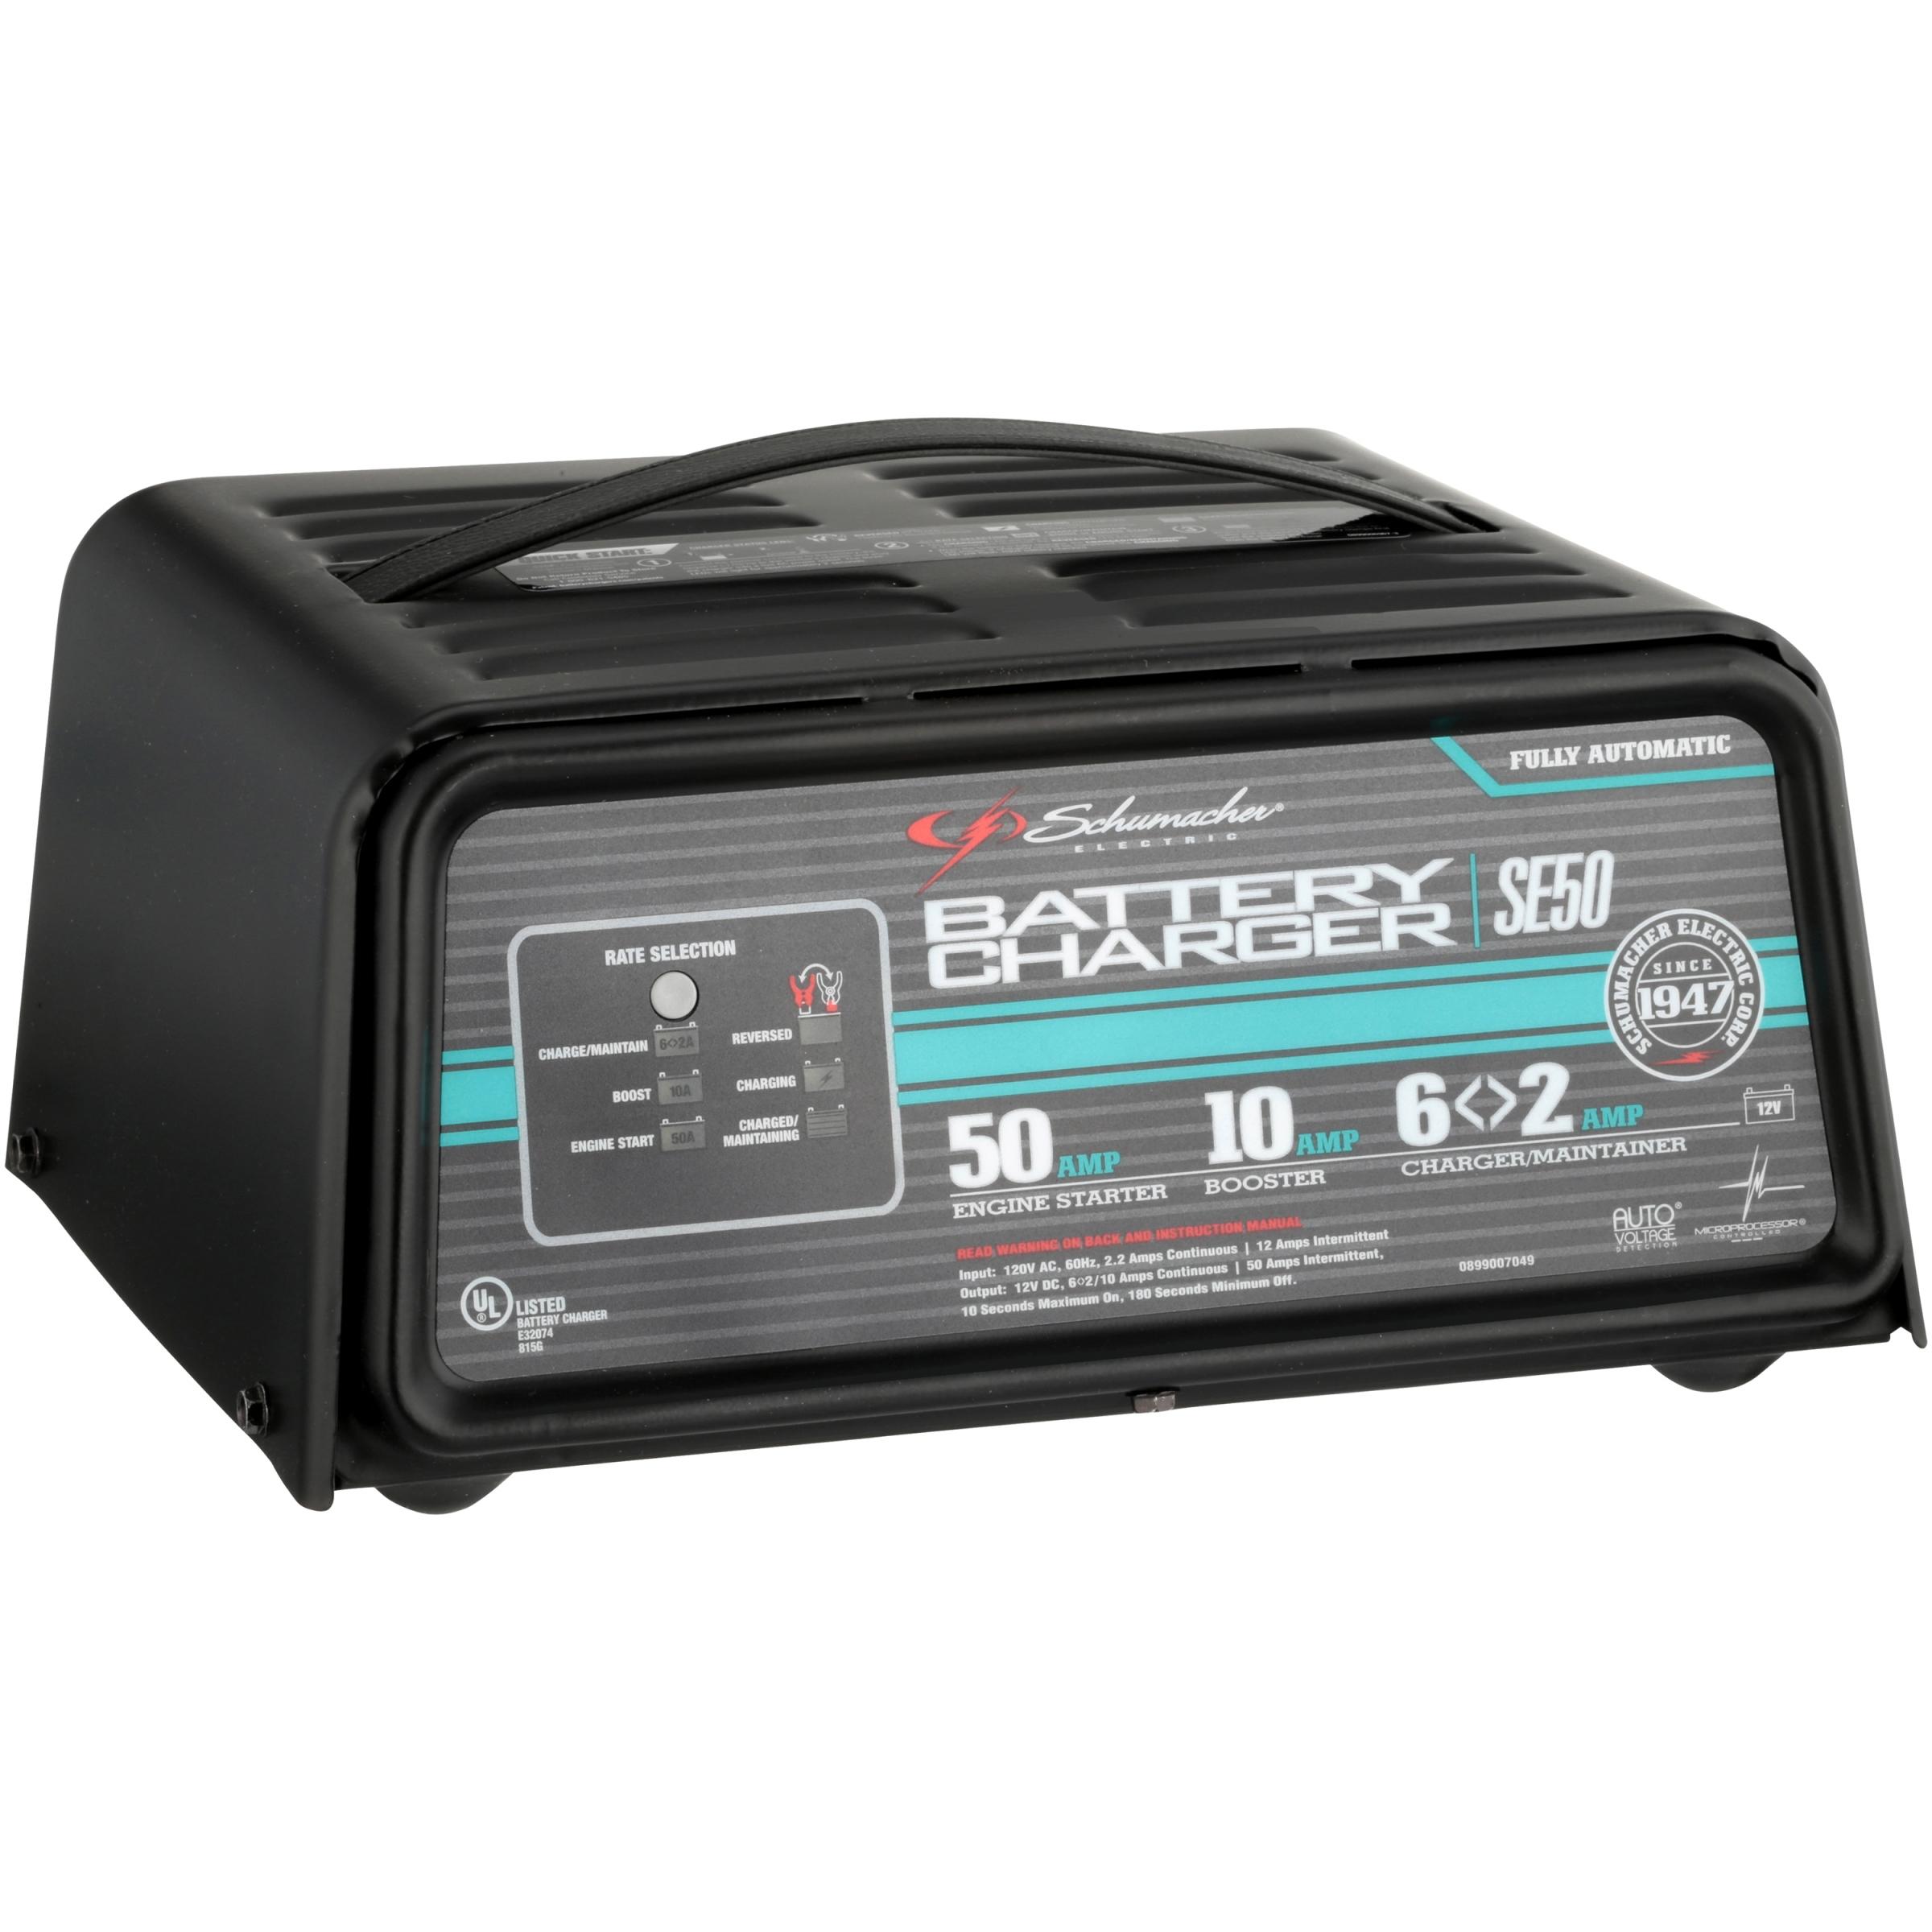 Schumacher Se50 12v Fully Automatic Battery Charger Walmart Com